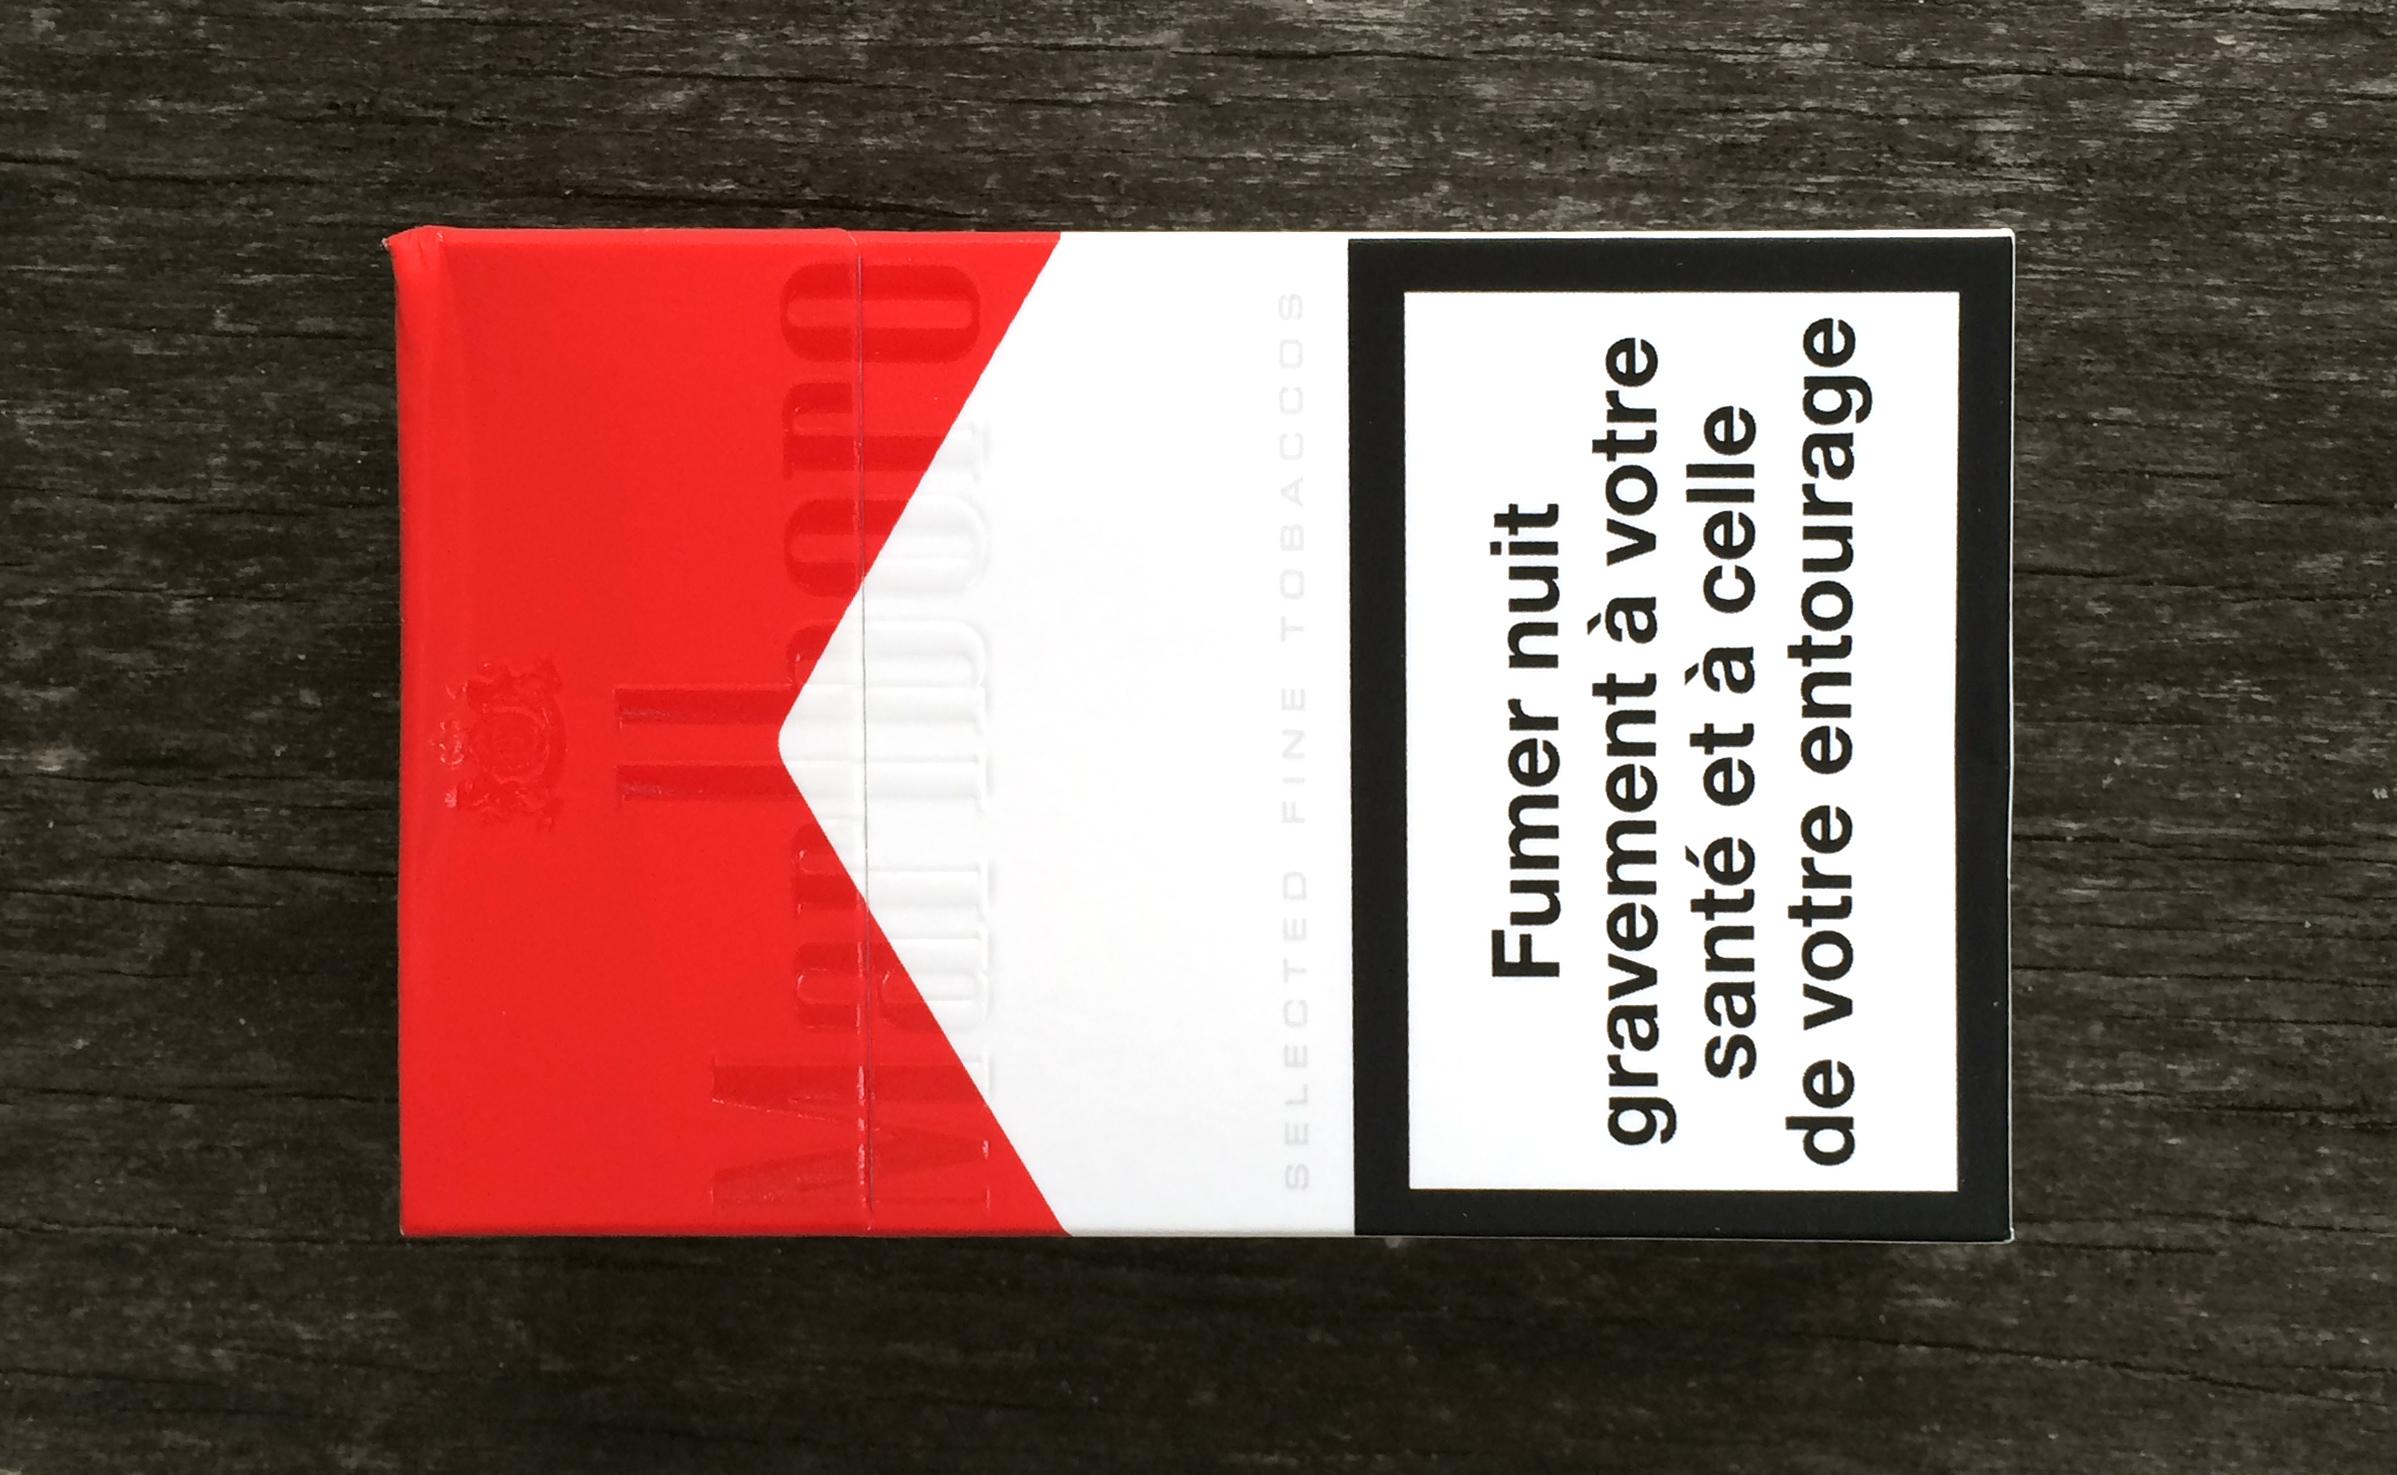 Cigarettes Marlboro vendors online